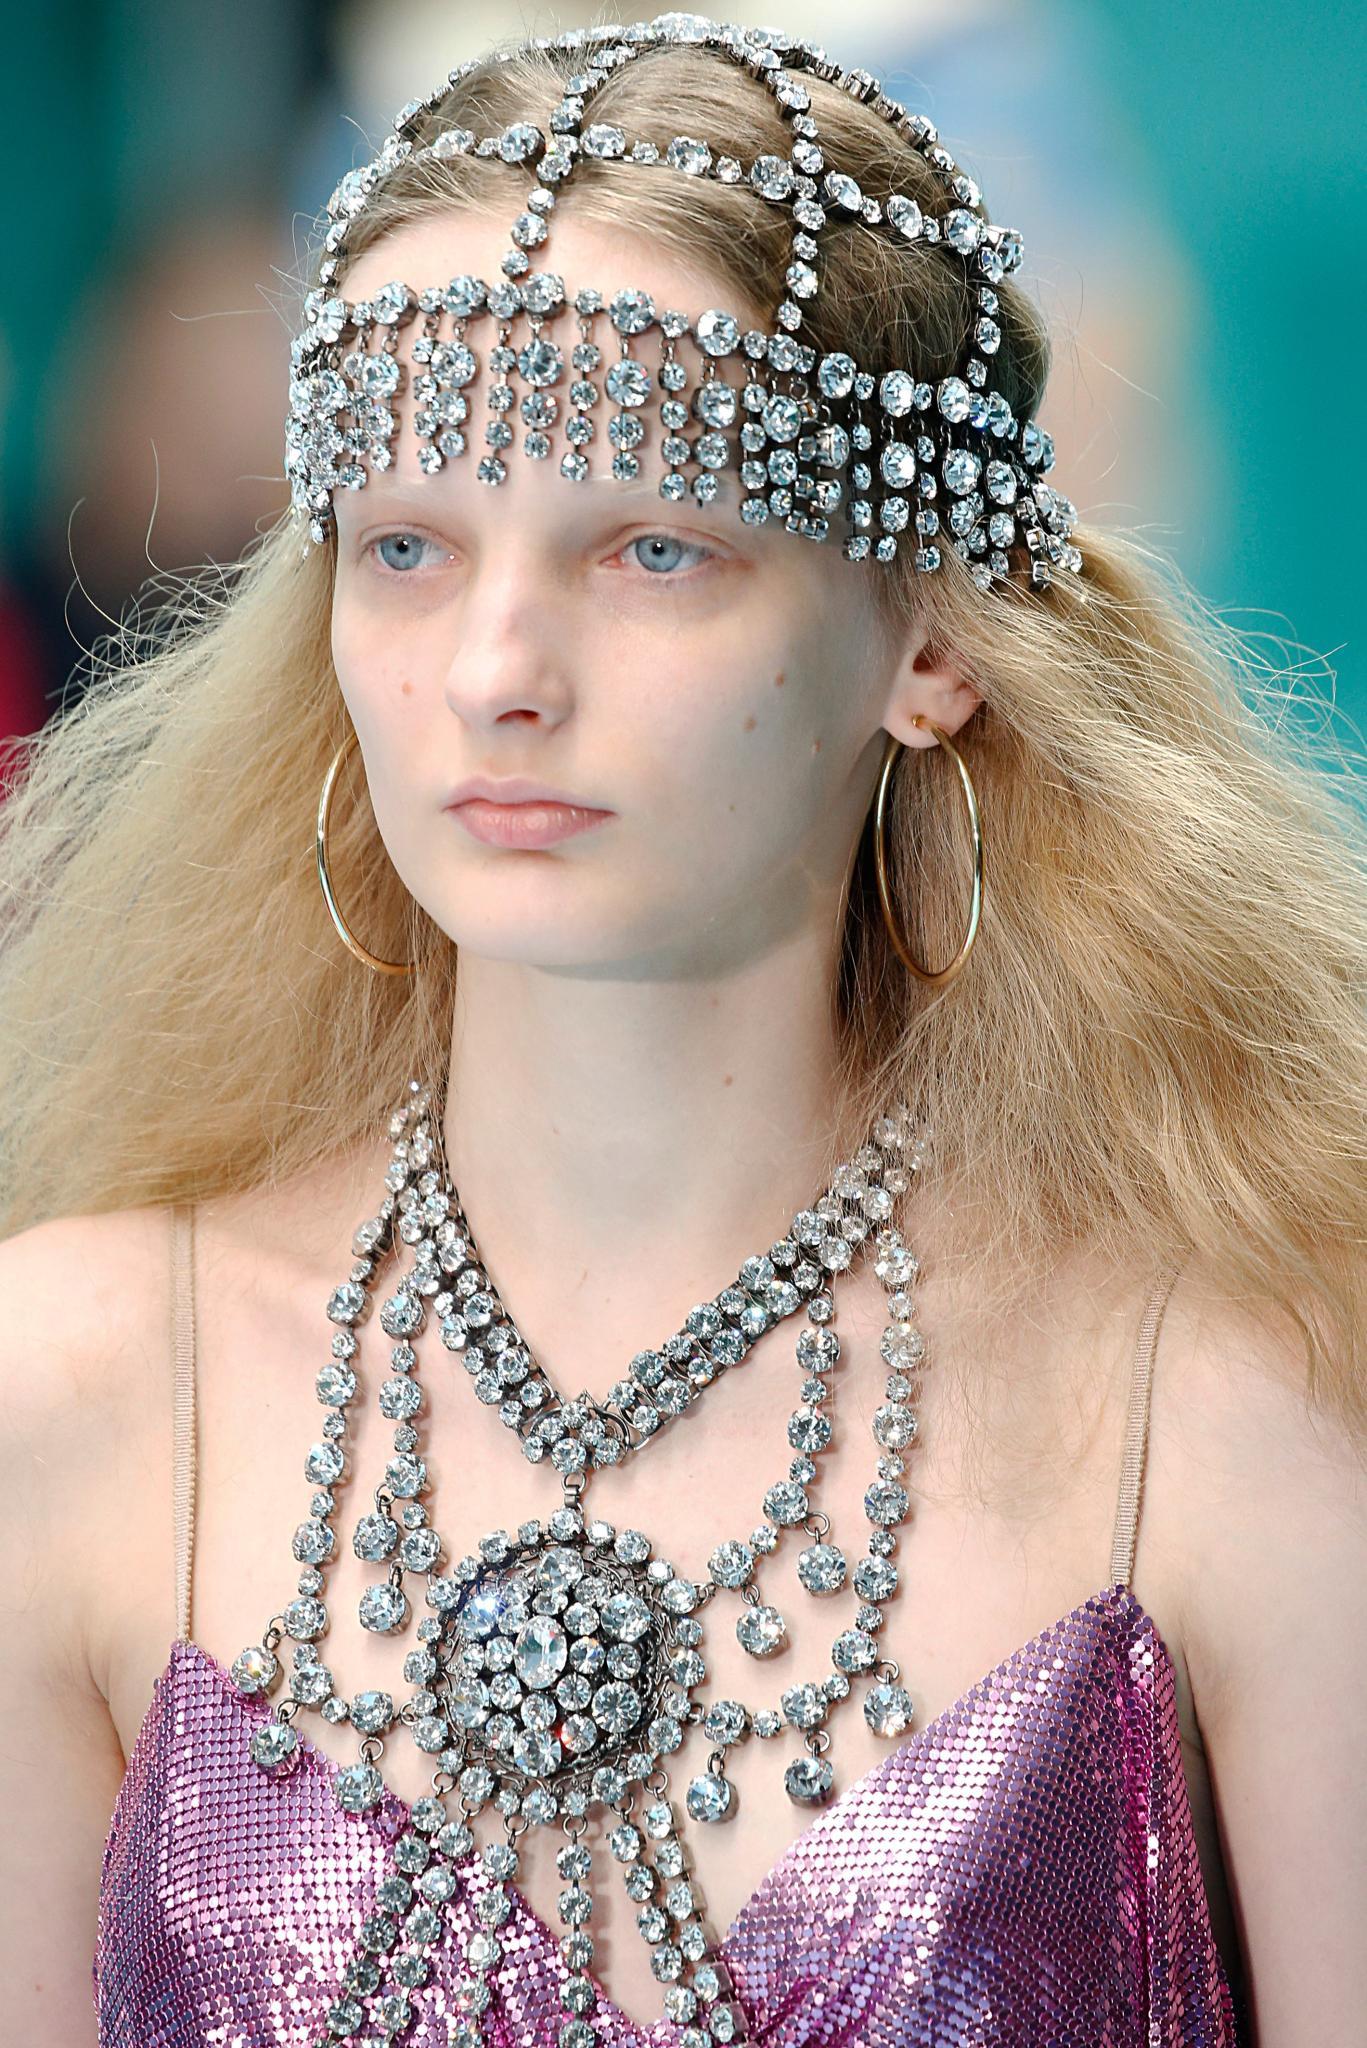 pelo largo rubio volumen frizz con ondas vincha tiara cristales accesorio gucci